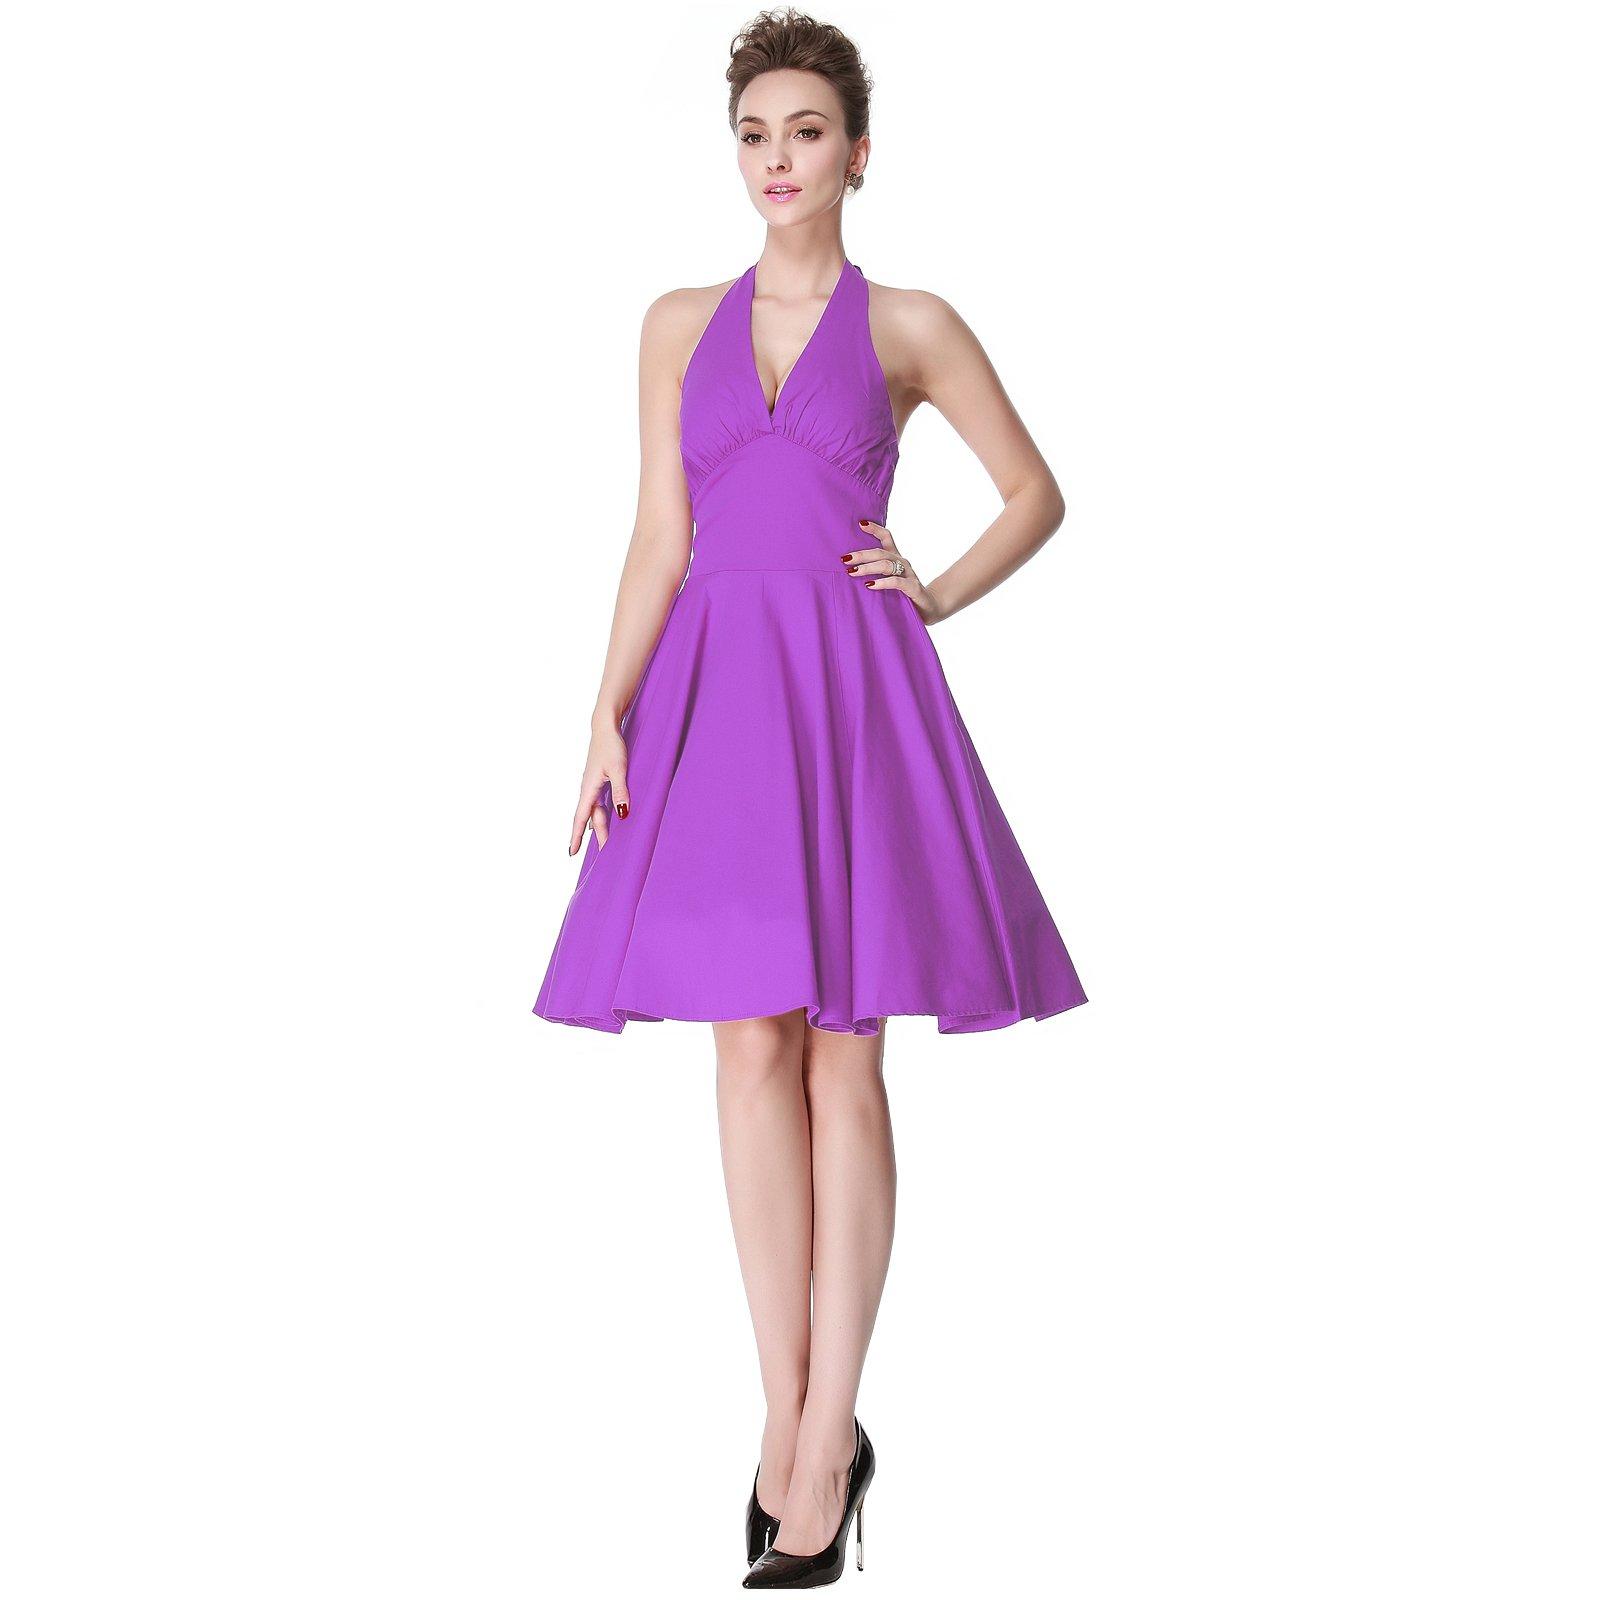 Heroecol Vintage 1950s 50s Dress Monroe Style Retro Rockabiily Cocktail S PP by Heroecol